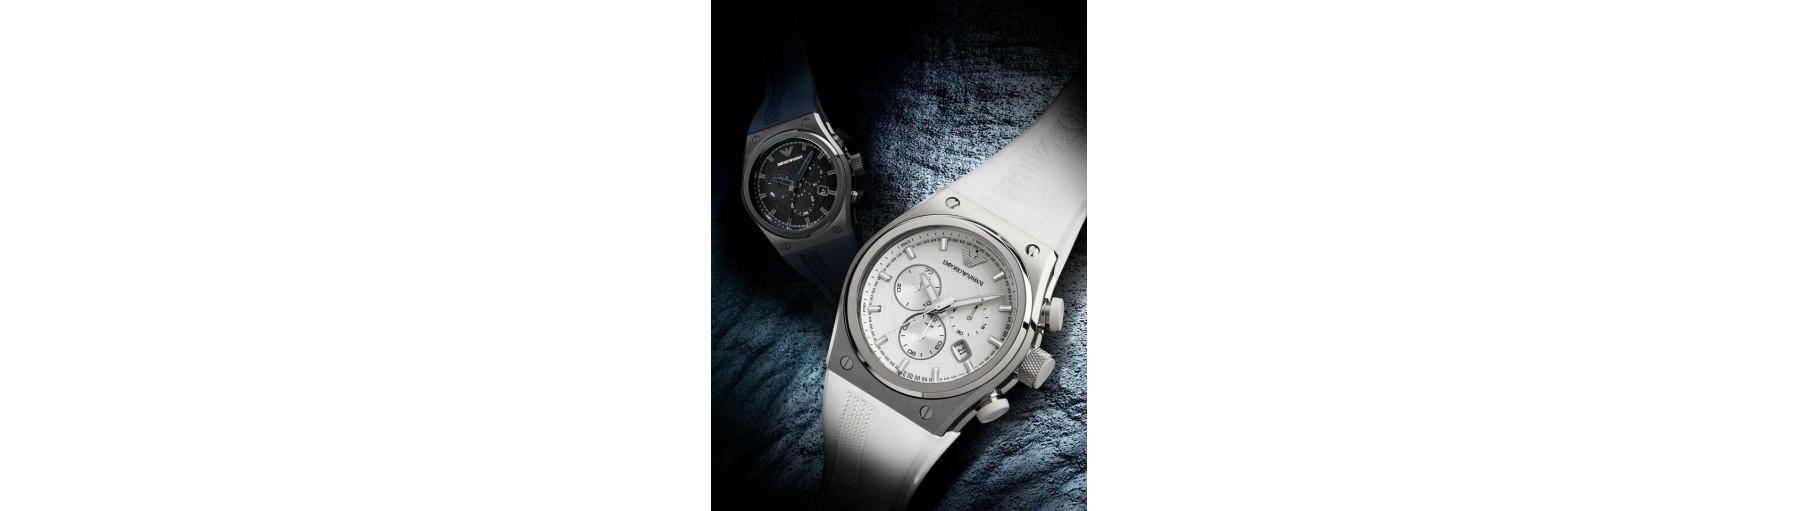 ARMANI relojes